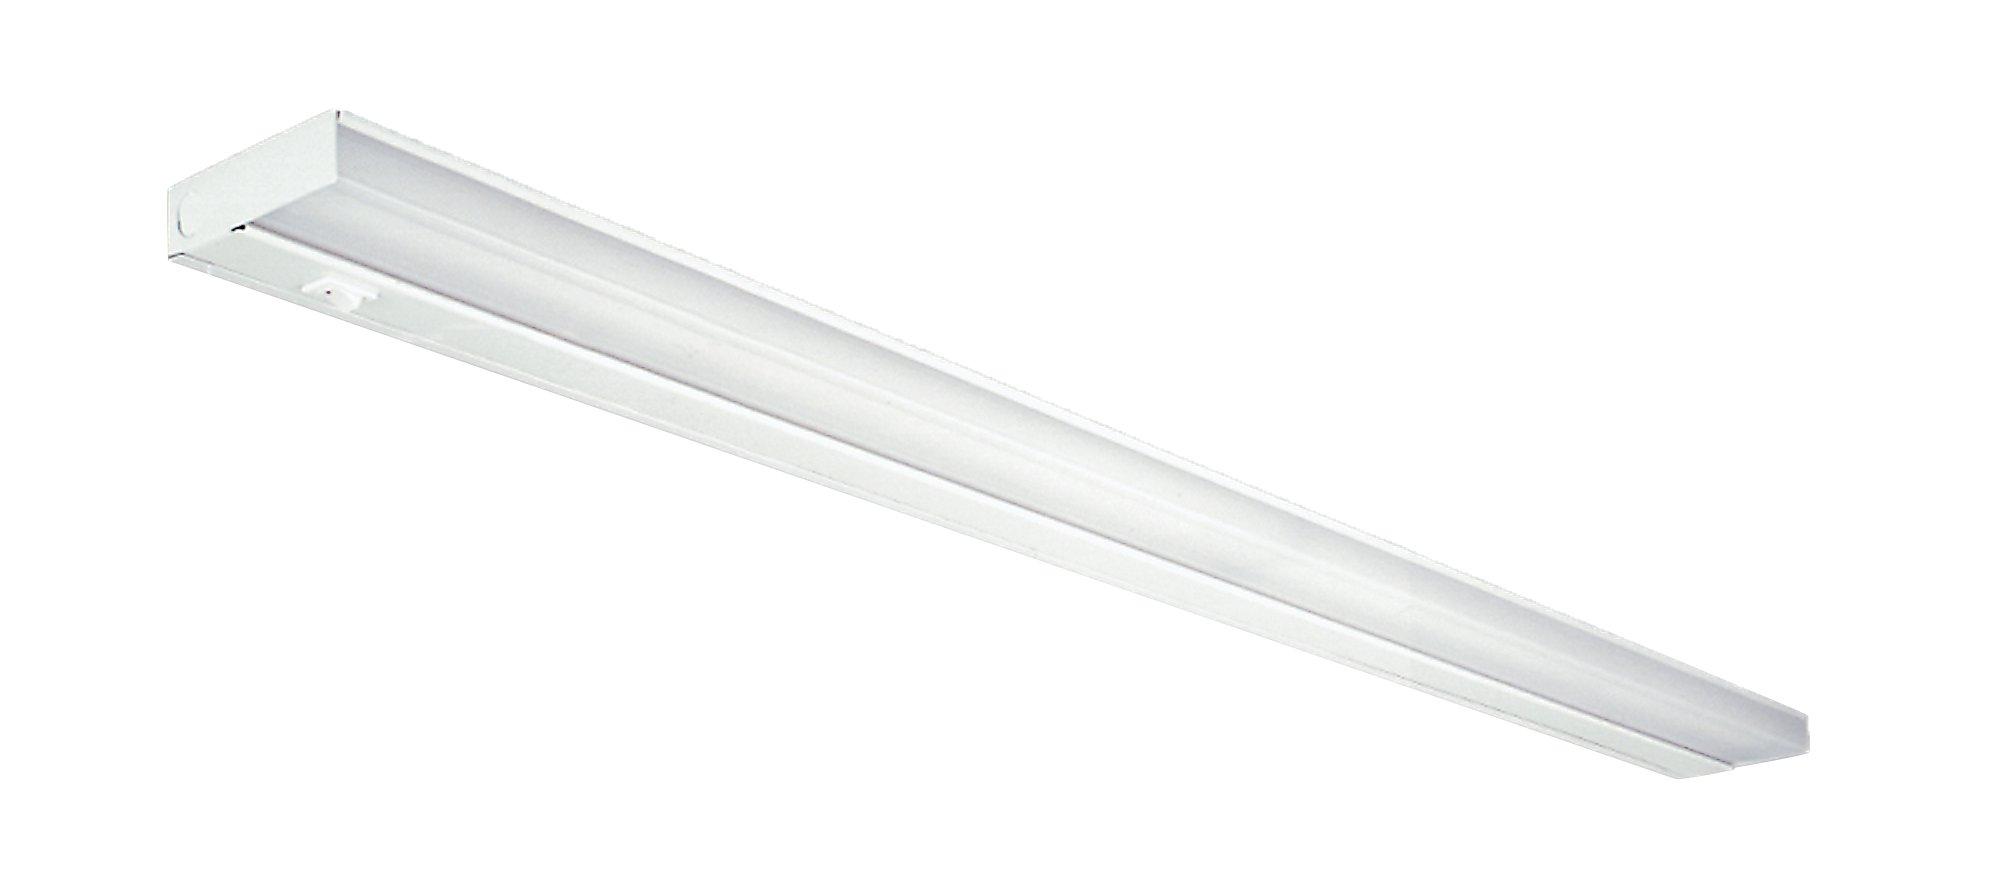 NICOR Lighting 42-Inch Dual 13-Watt T5 Fluorescent Under Cabinet Light, White (10368EB)